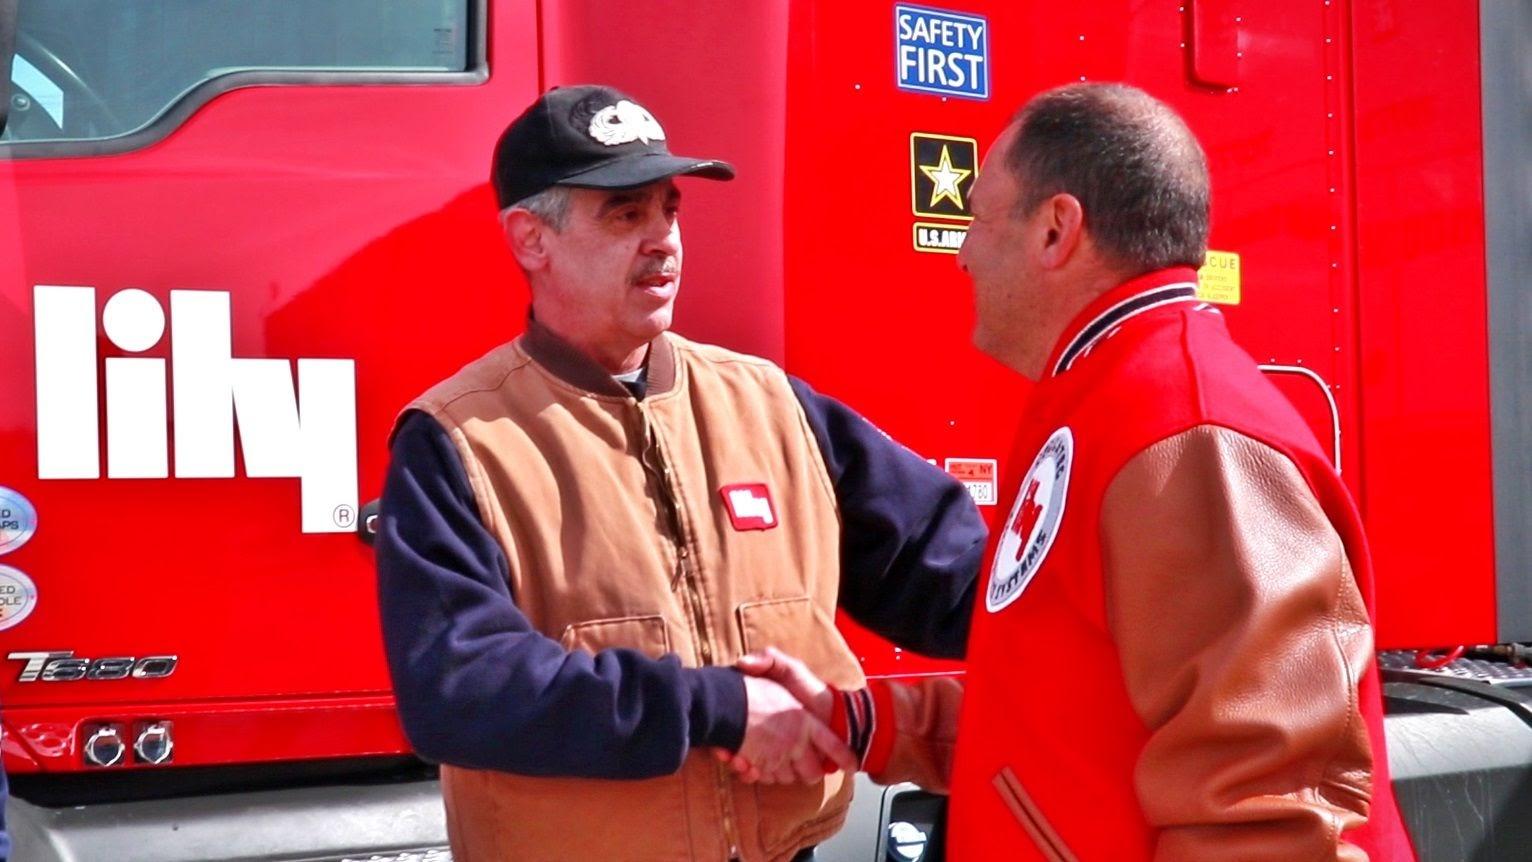 veteran truck drivers